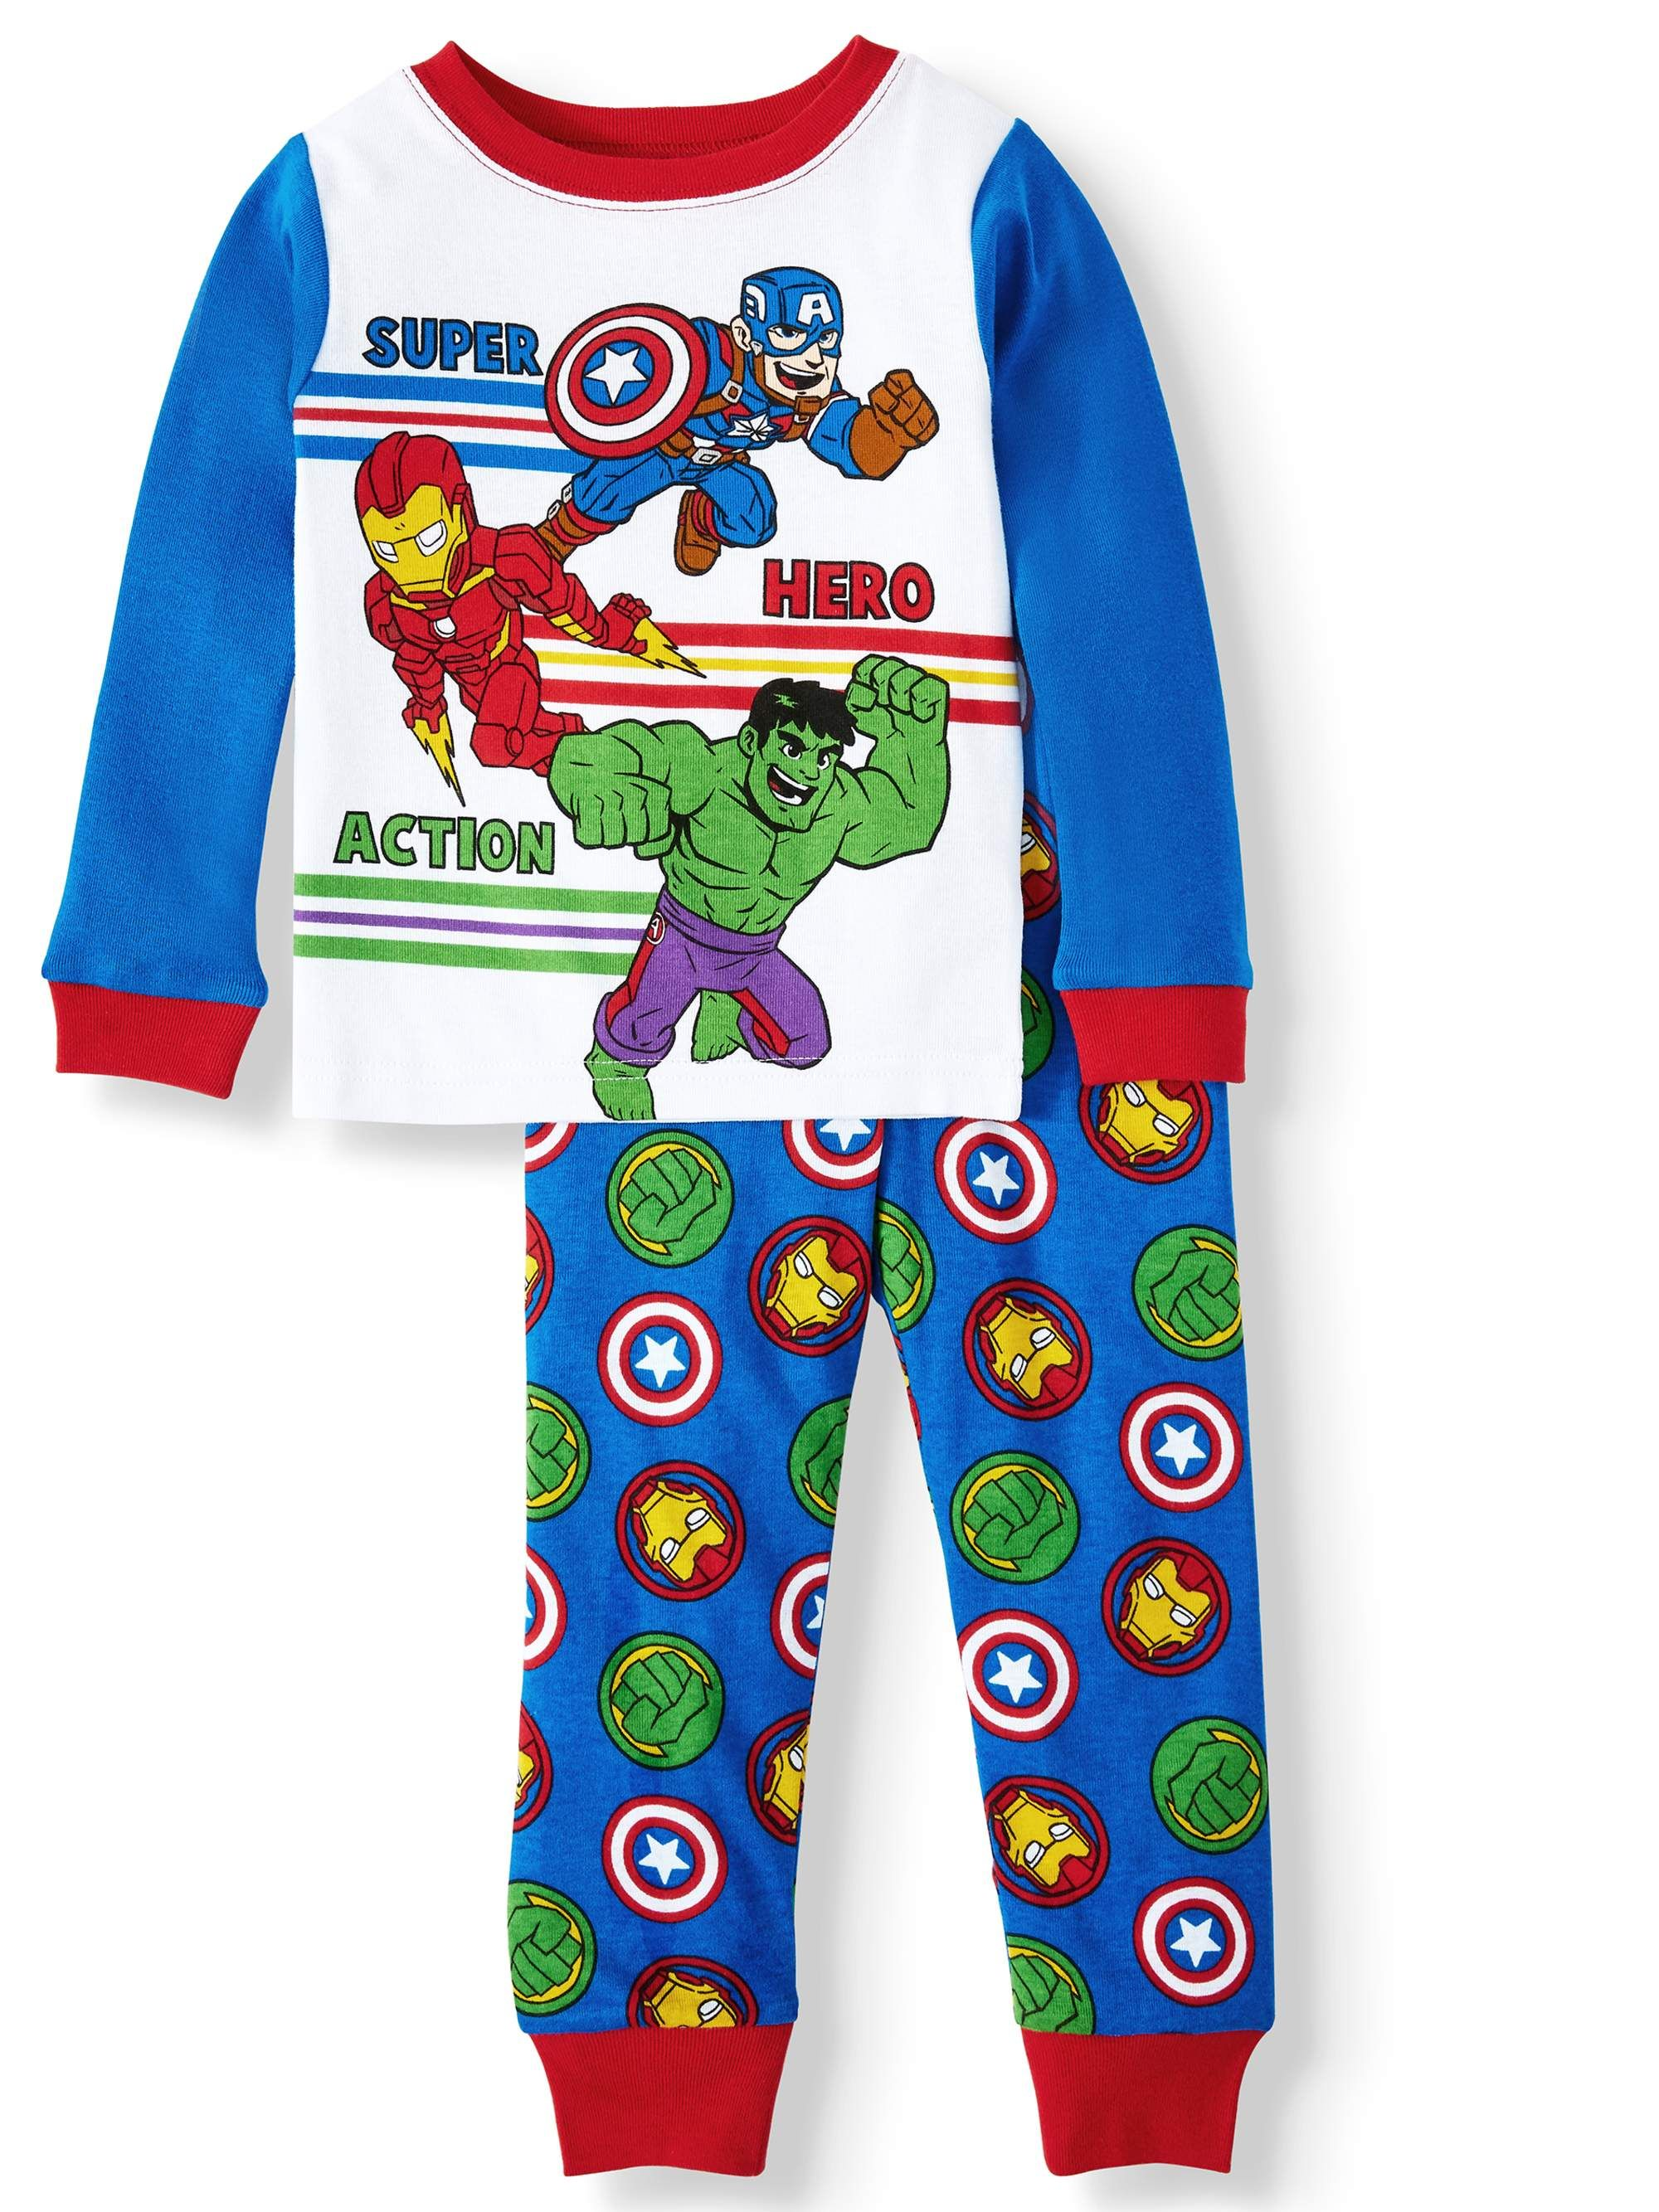 Super Hero Soft Knit Long Sleeve TOP with Soft Knit Bats ON Pajama Set